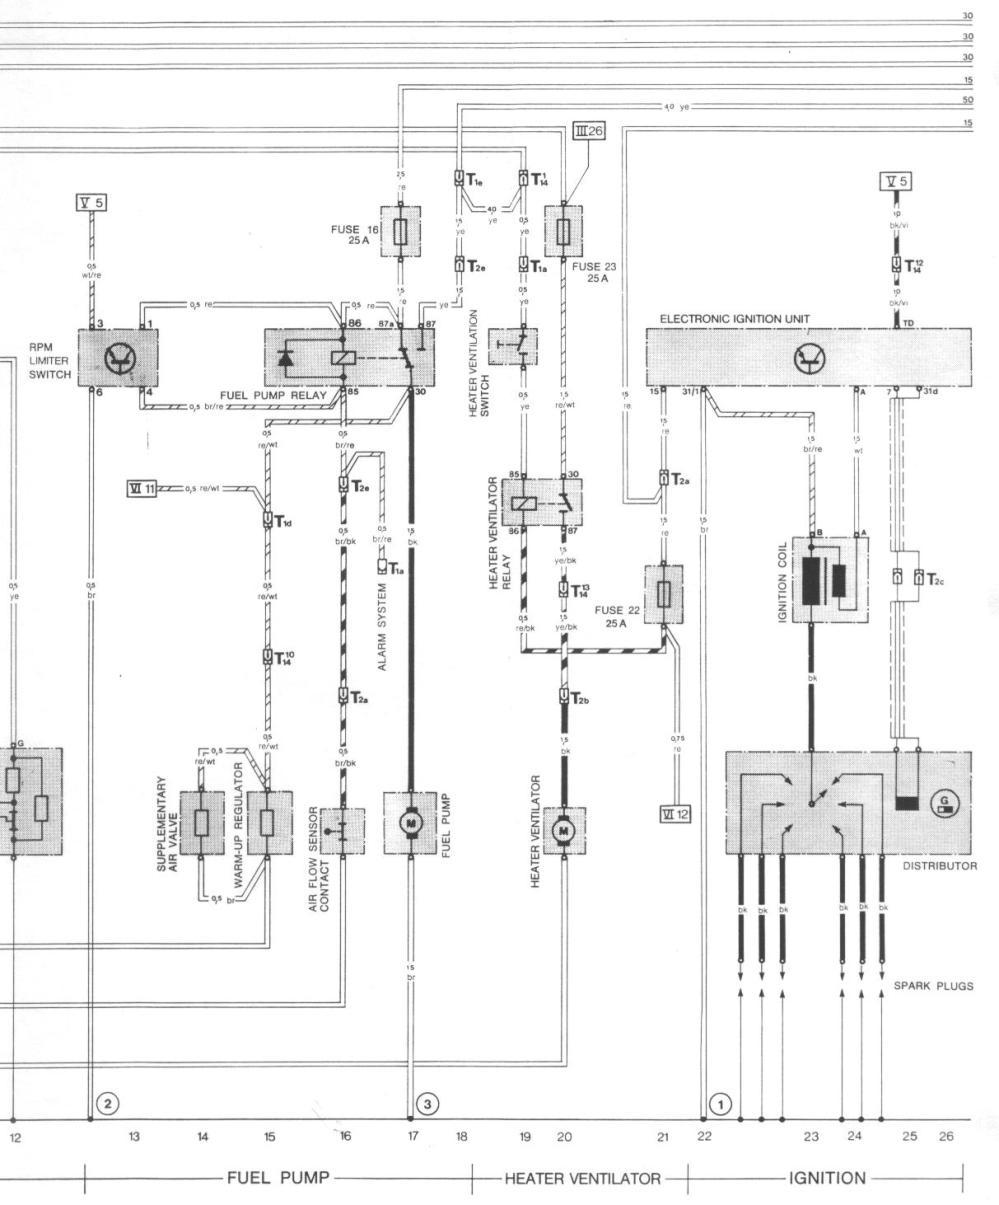 medium resolution of 1976 porsche wiring diagram wiring libraryporsche 911 3 2 fuse box electrical wiring diagrams 1976 porsche